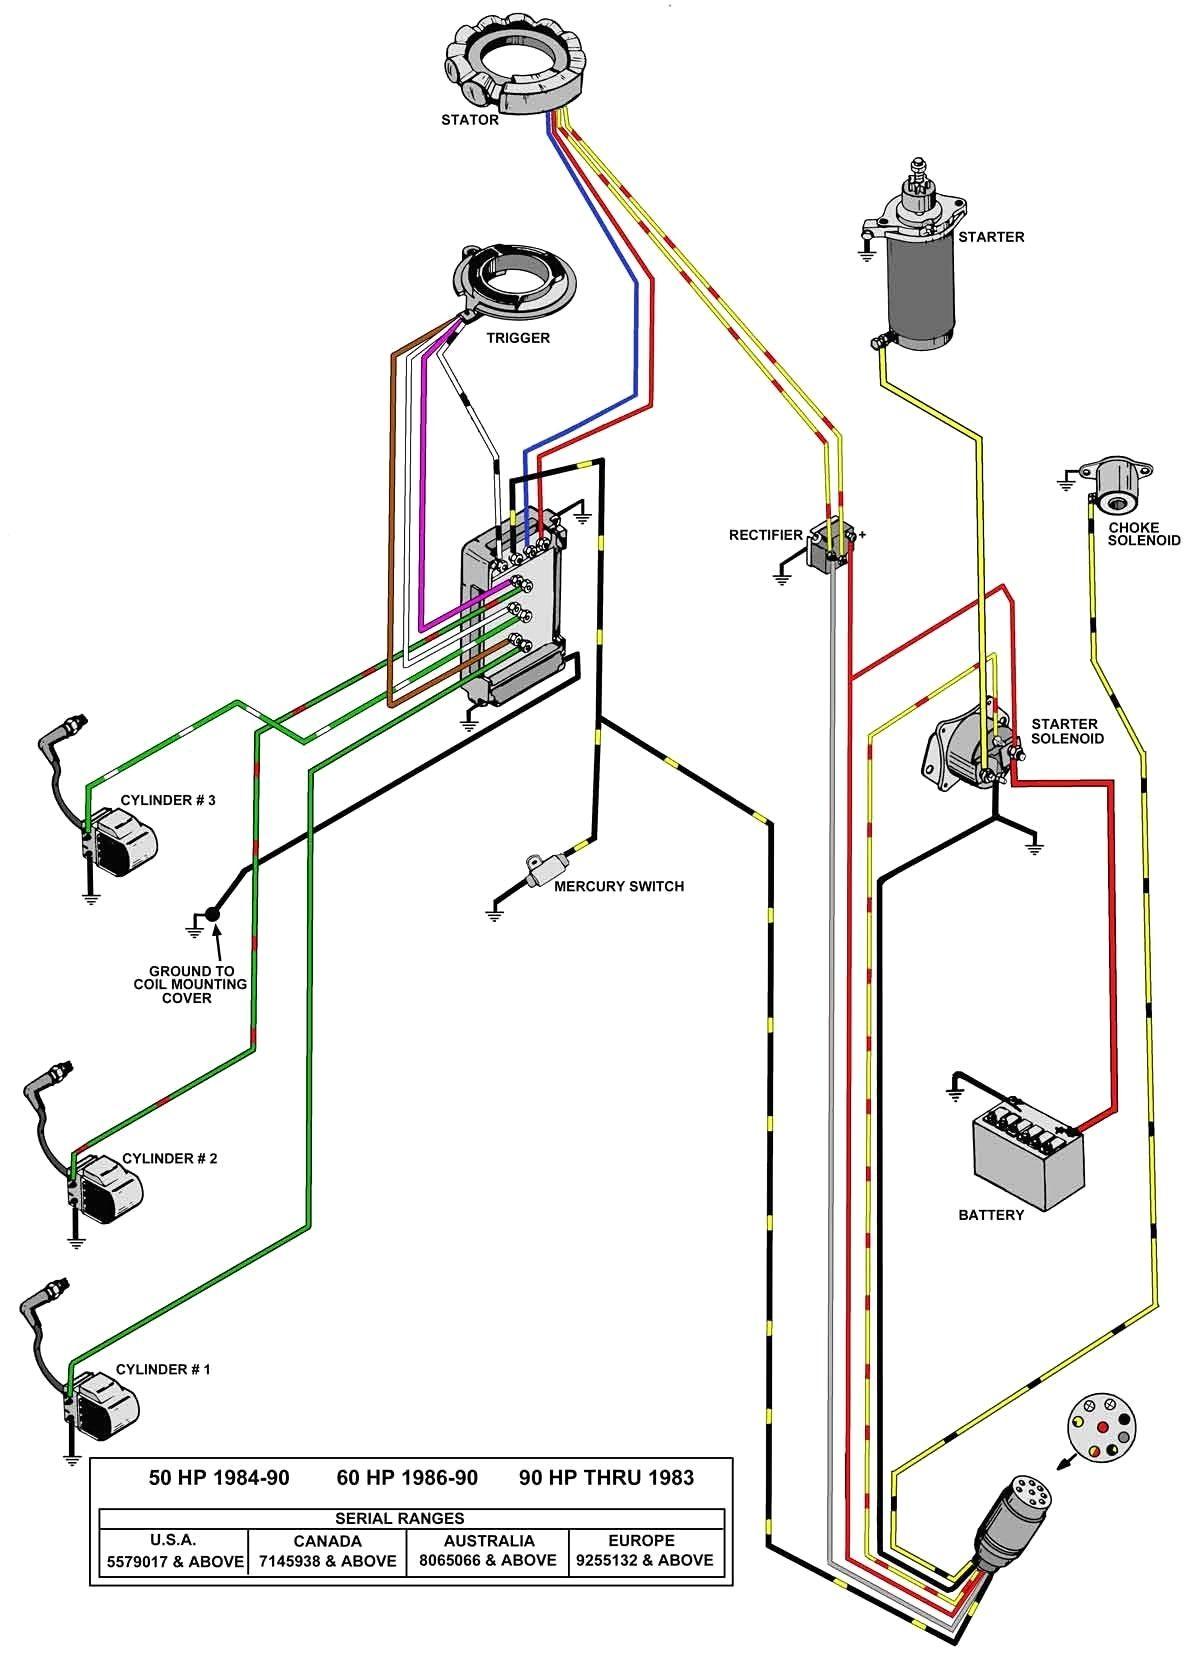 Mercury Marine Ignition Switch Wiring Diagram Wiringdiagram Org Mercury Outboard Outboard Mercury Marine